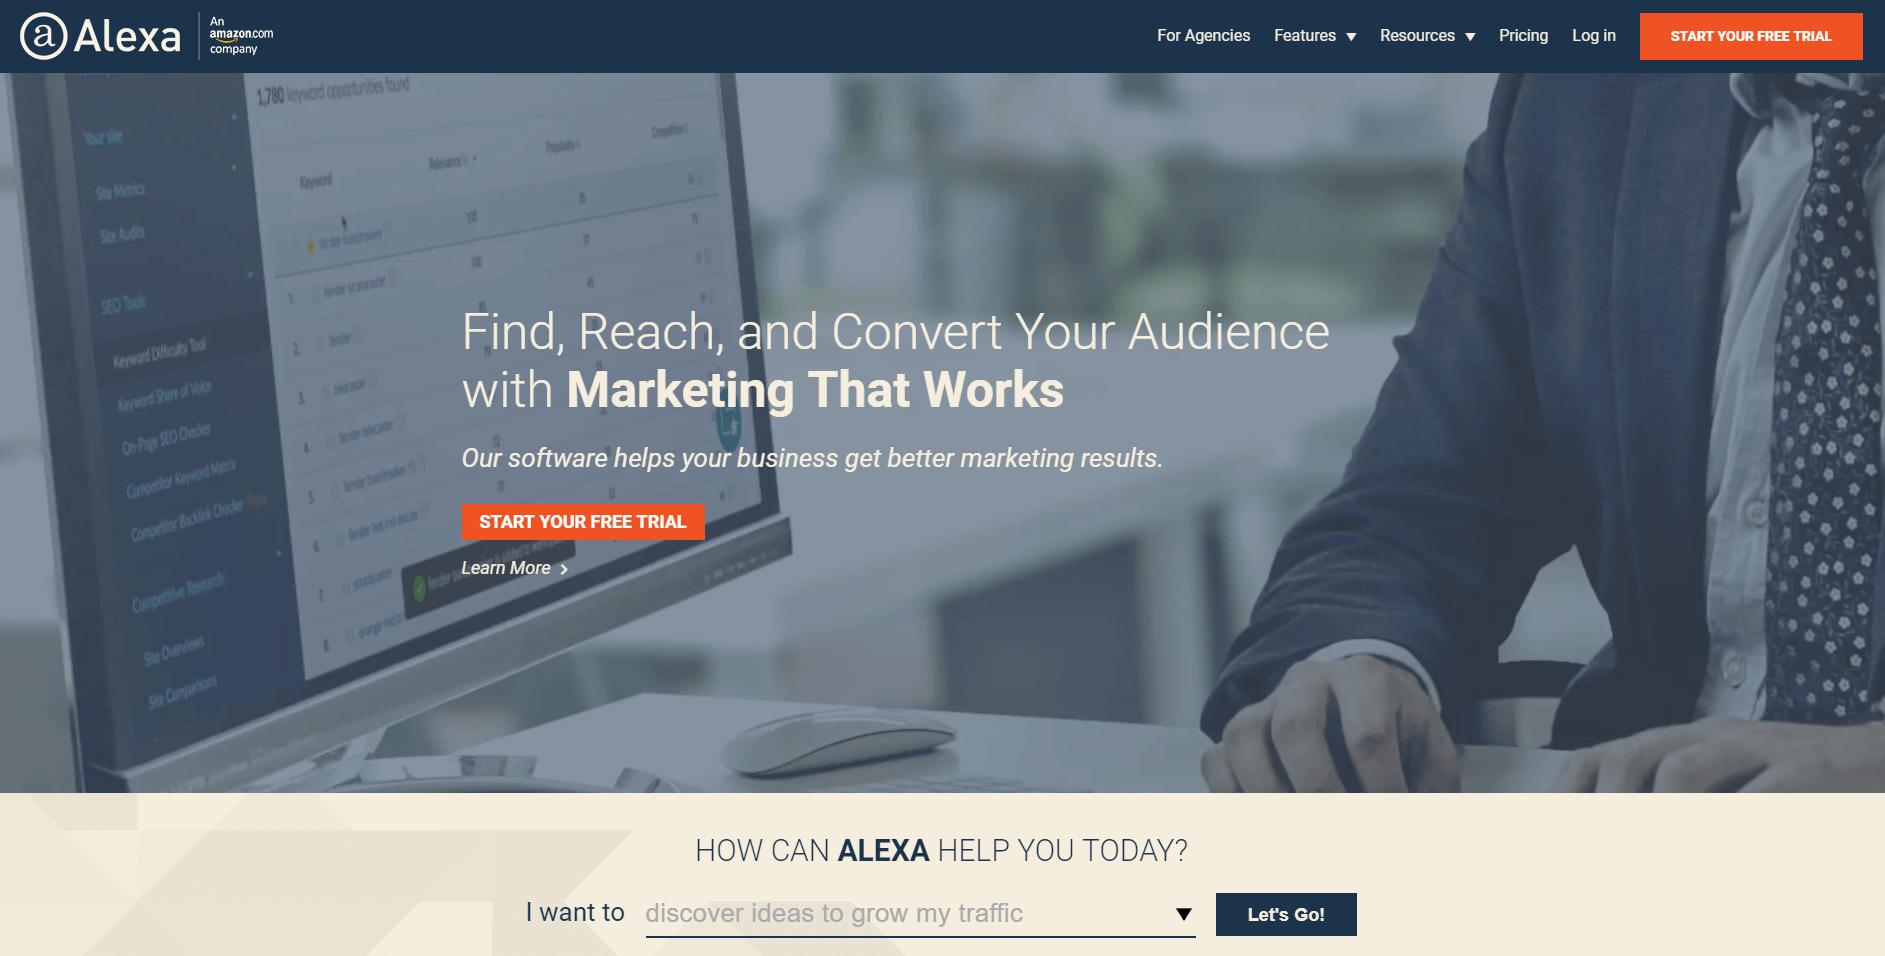 Alexa - convert audience